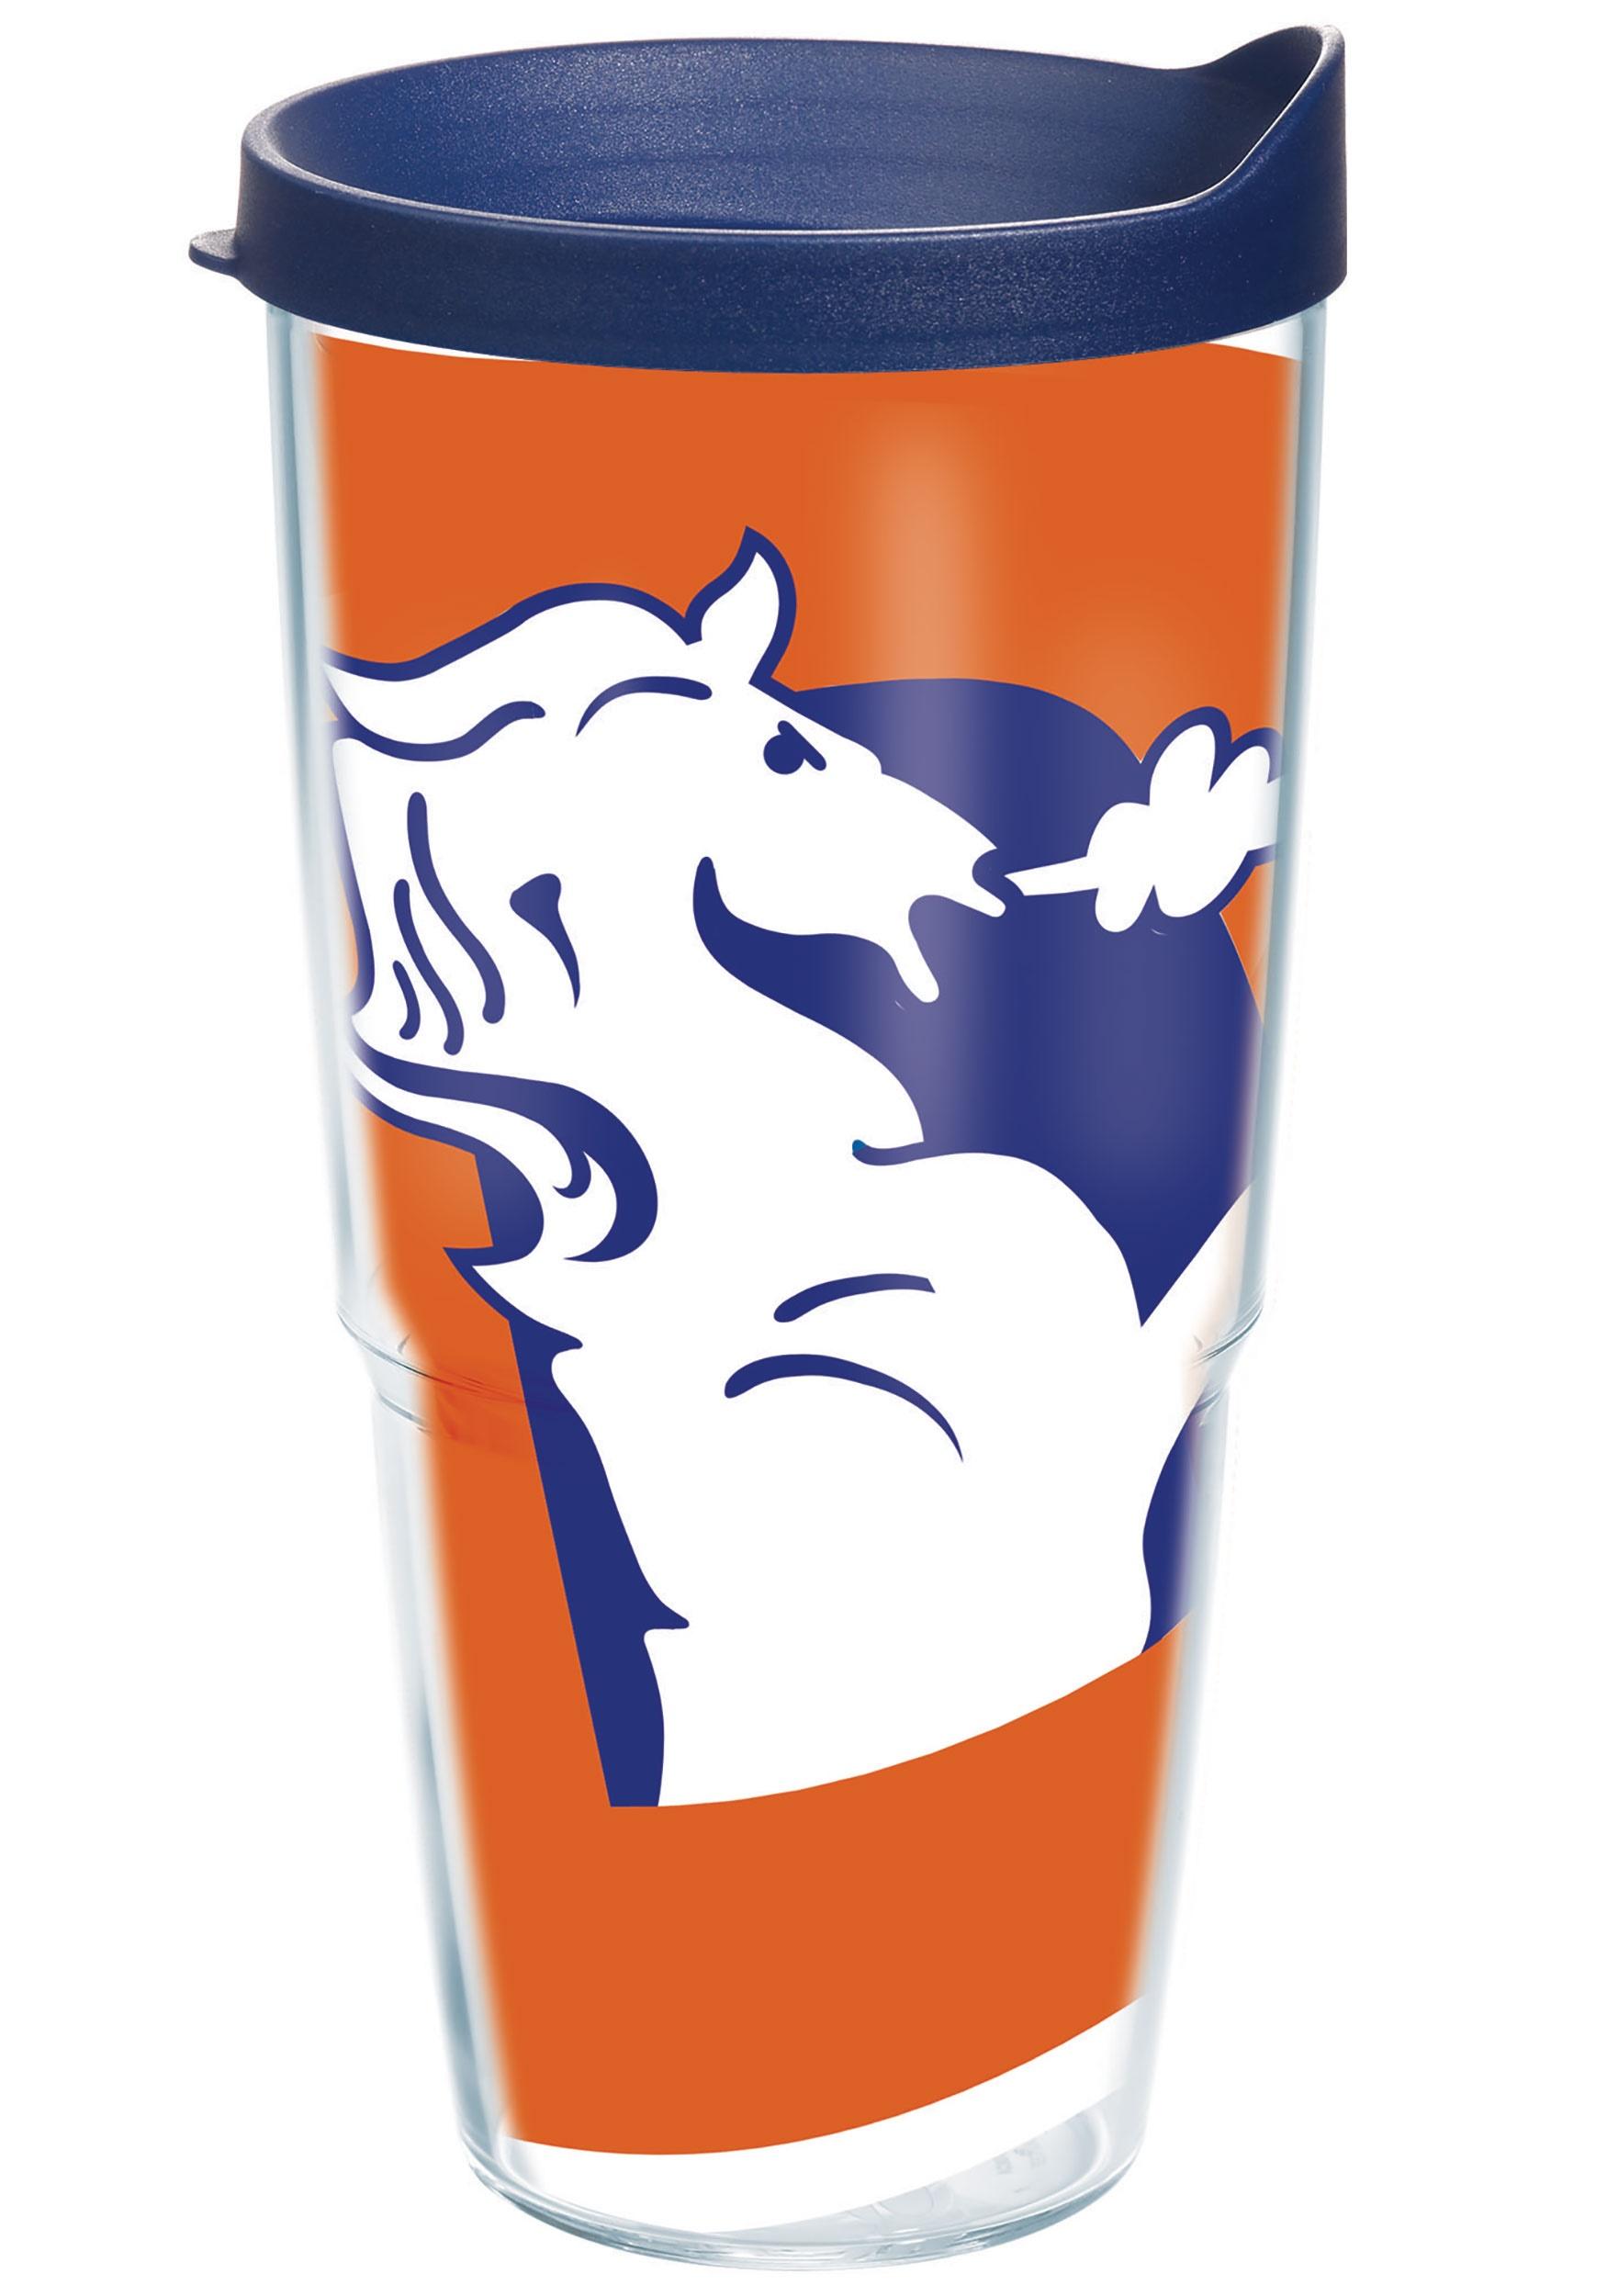 Tervis Denver Broncos 24 oz NFL Legacy Tumbler w/ Blue Lid